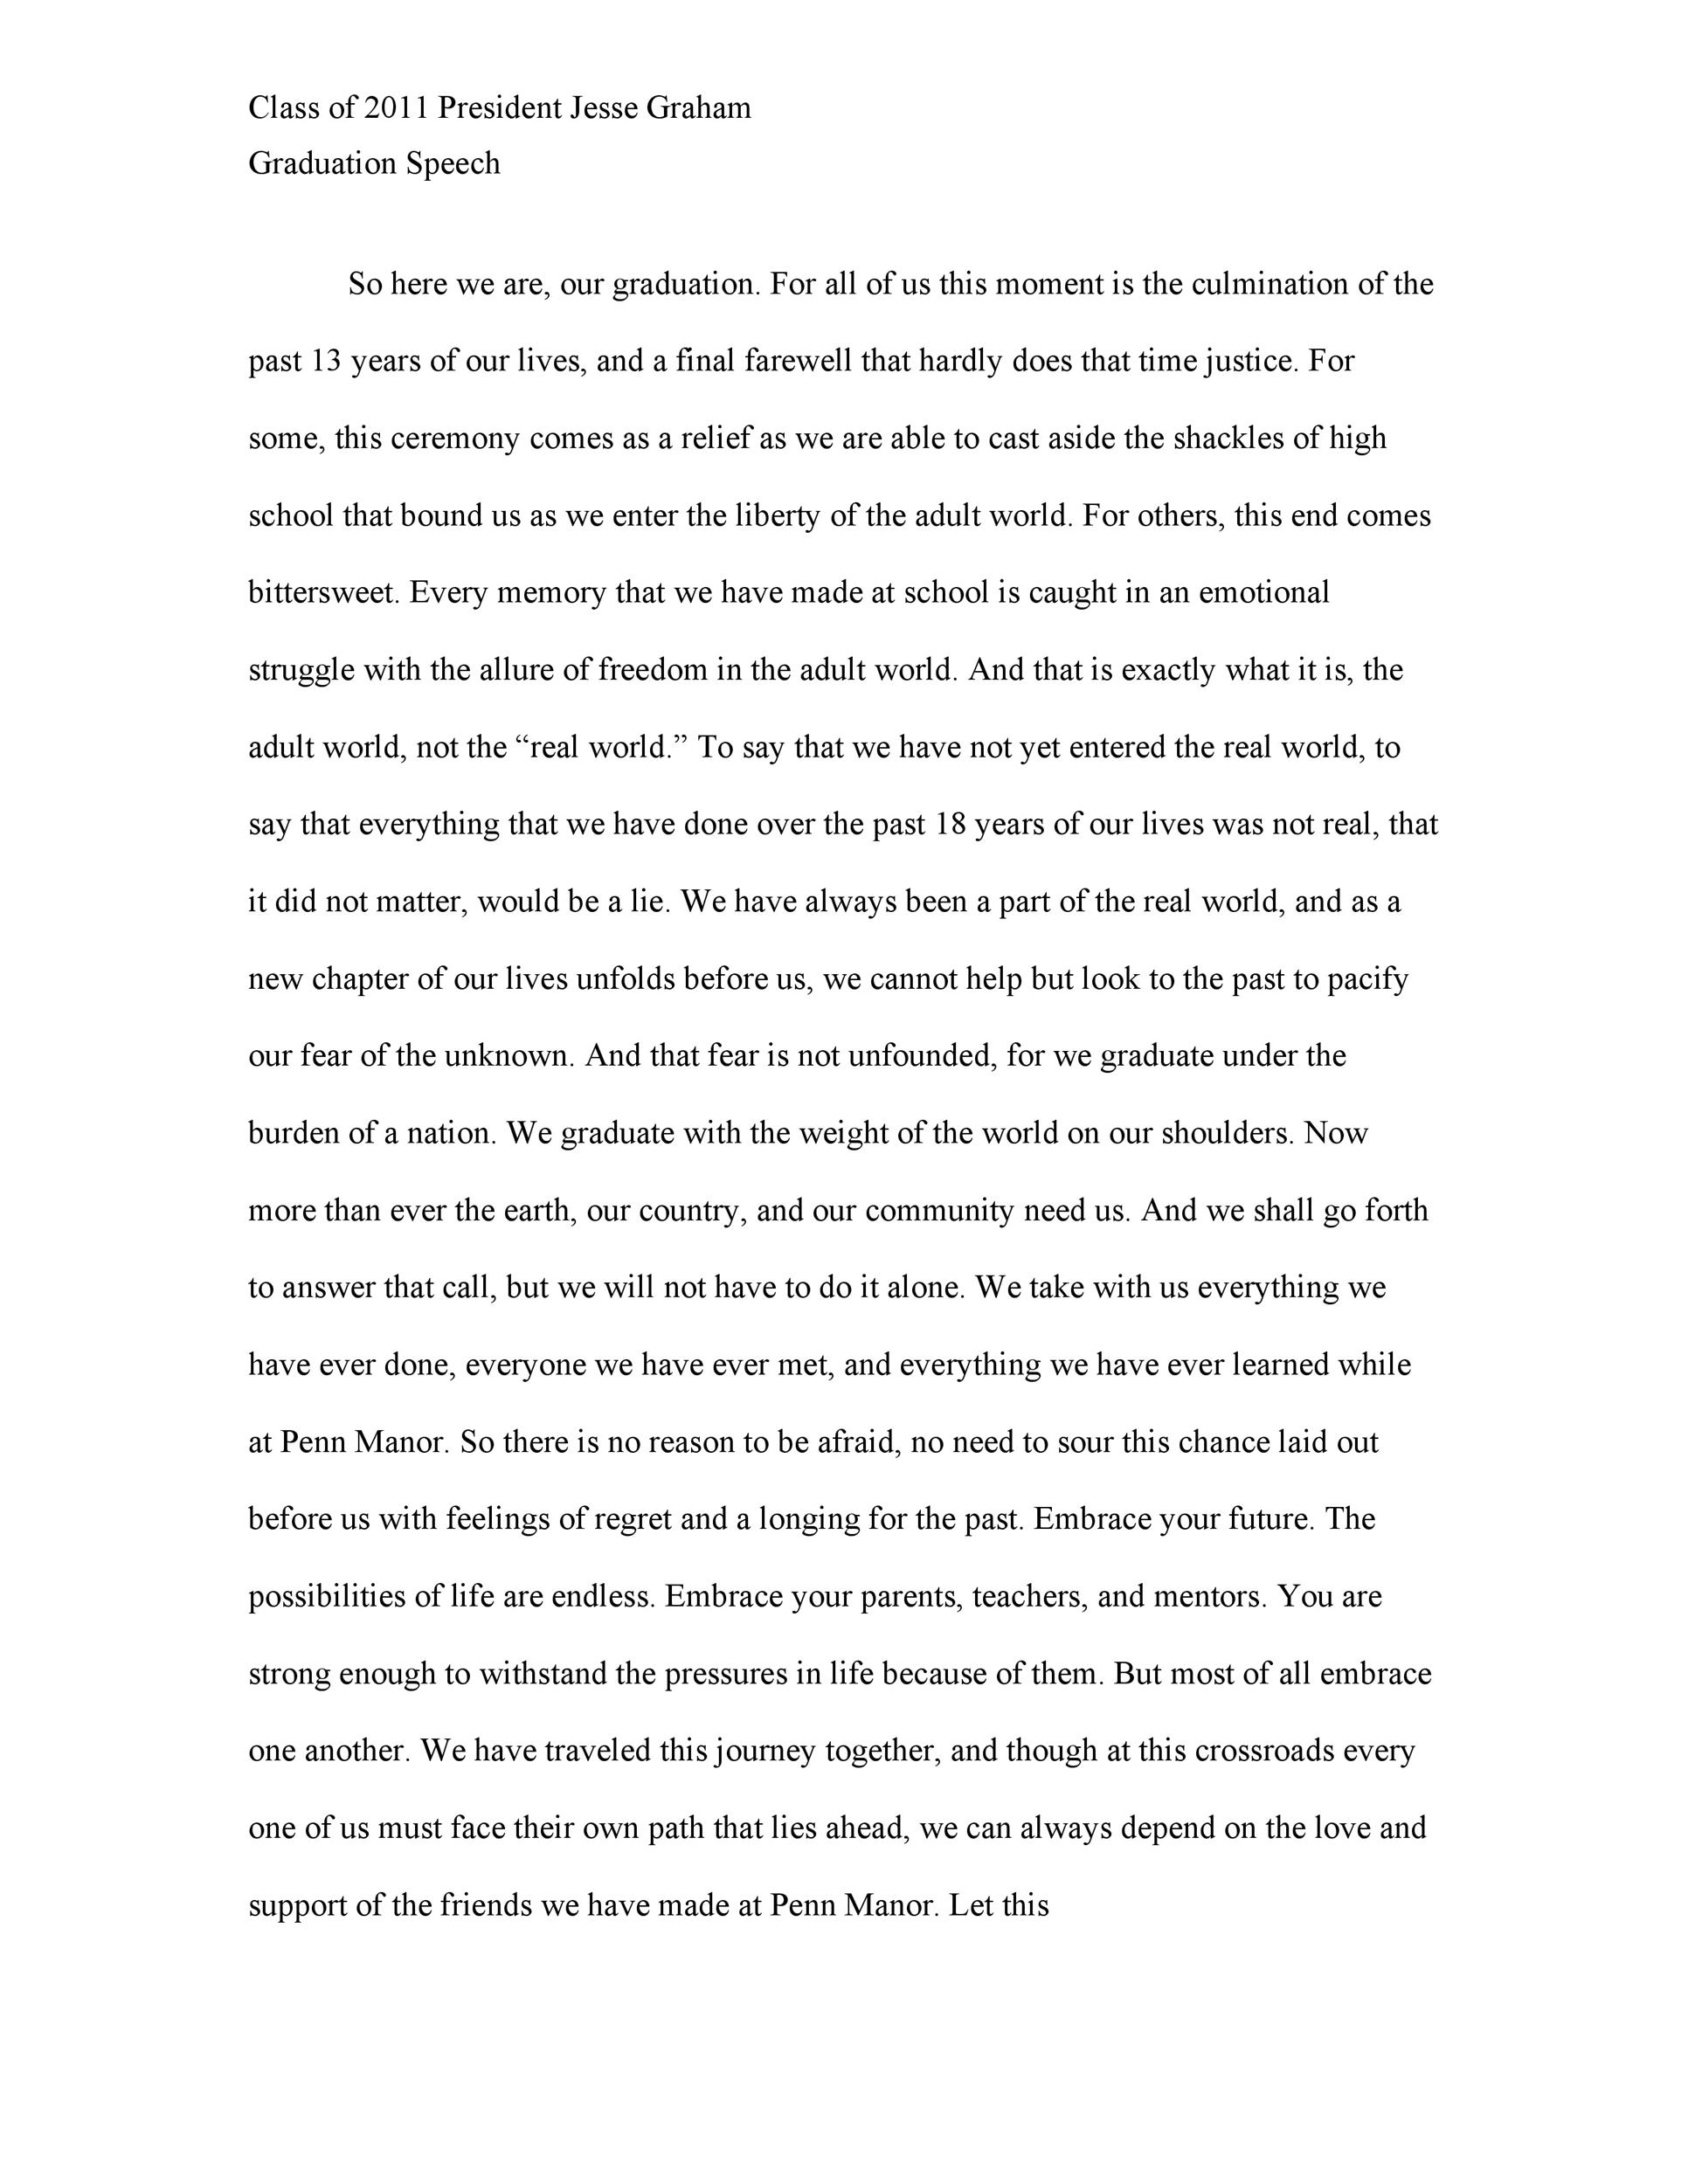 Free graduation speech example 45